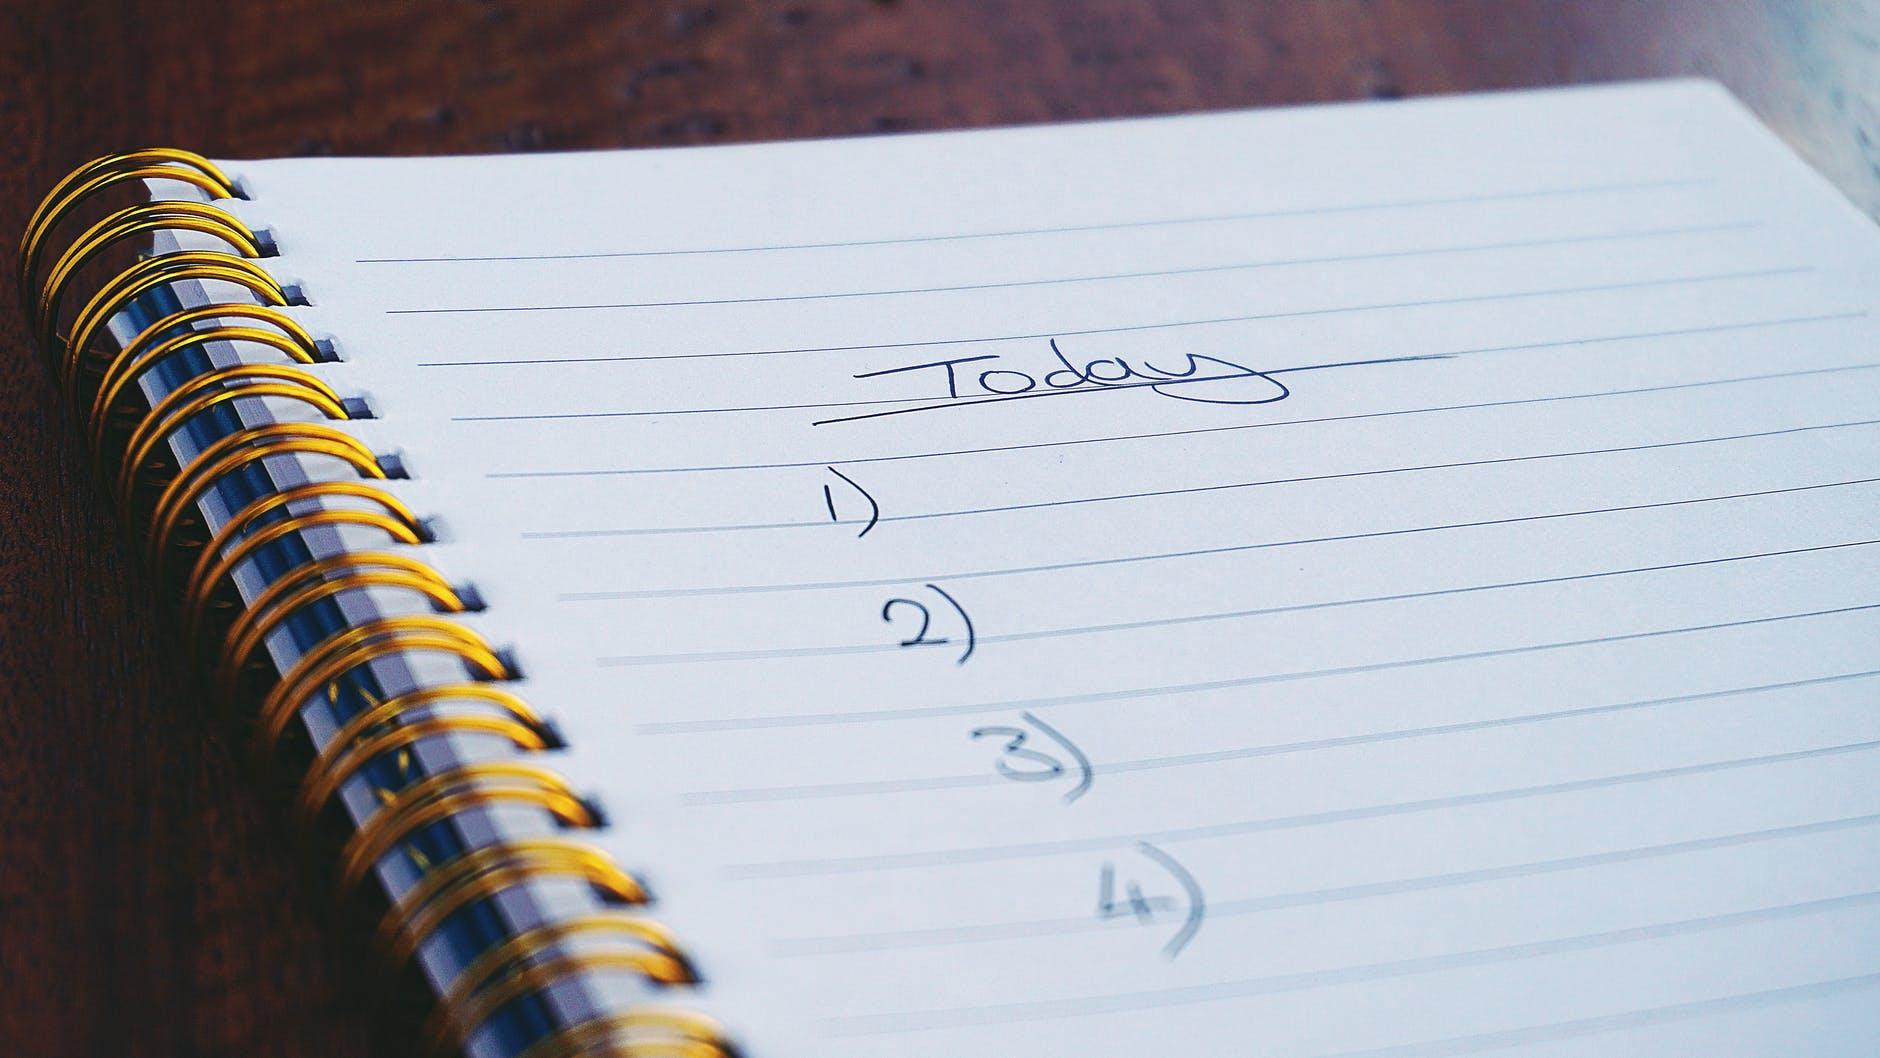 checklist mental health brogliebox broglieblog therapy teletherapy therapist stress relief